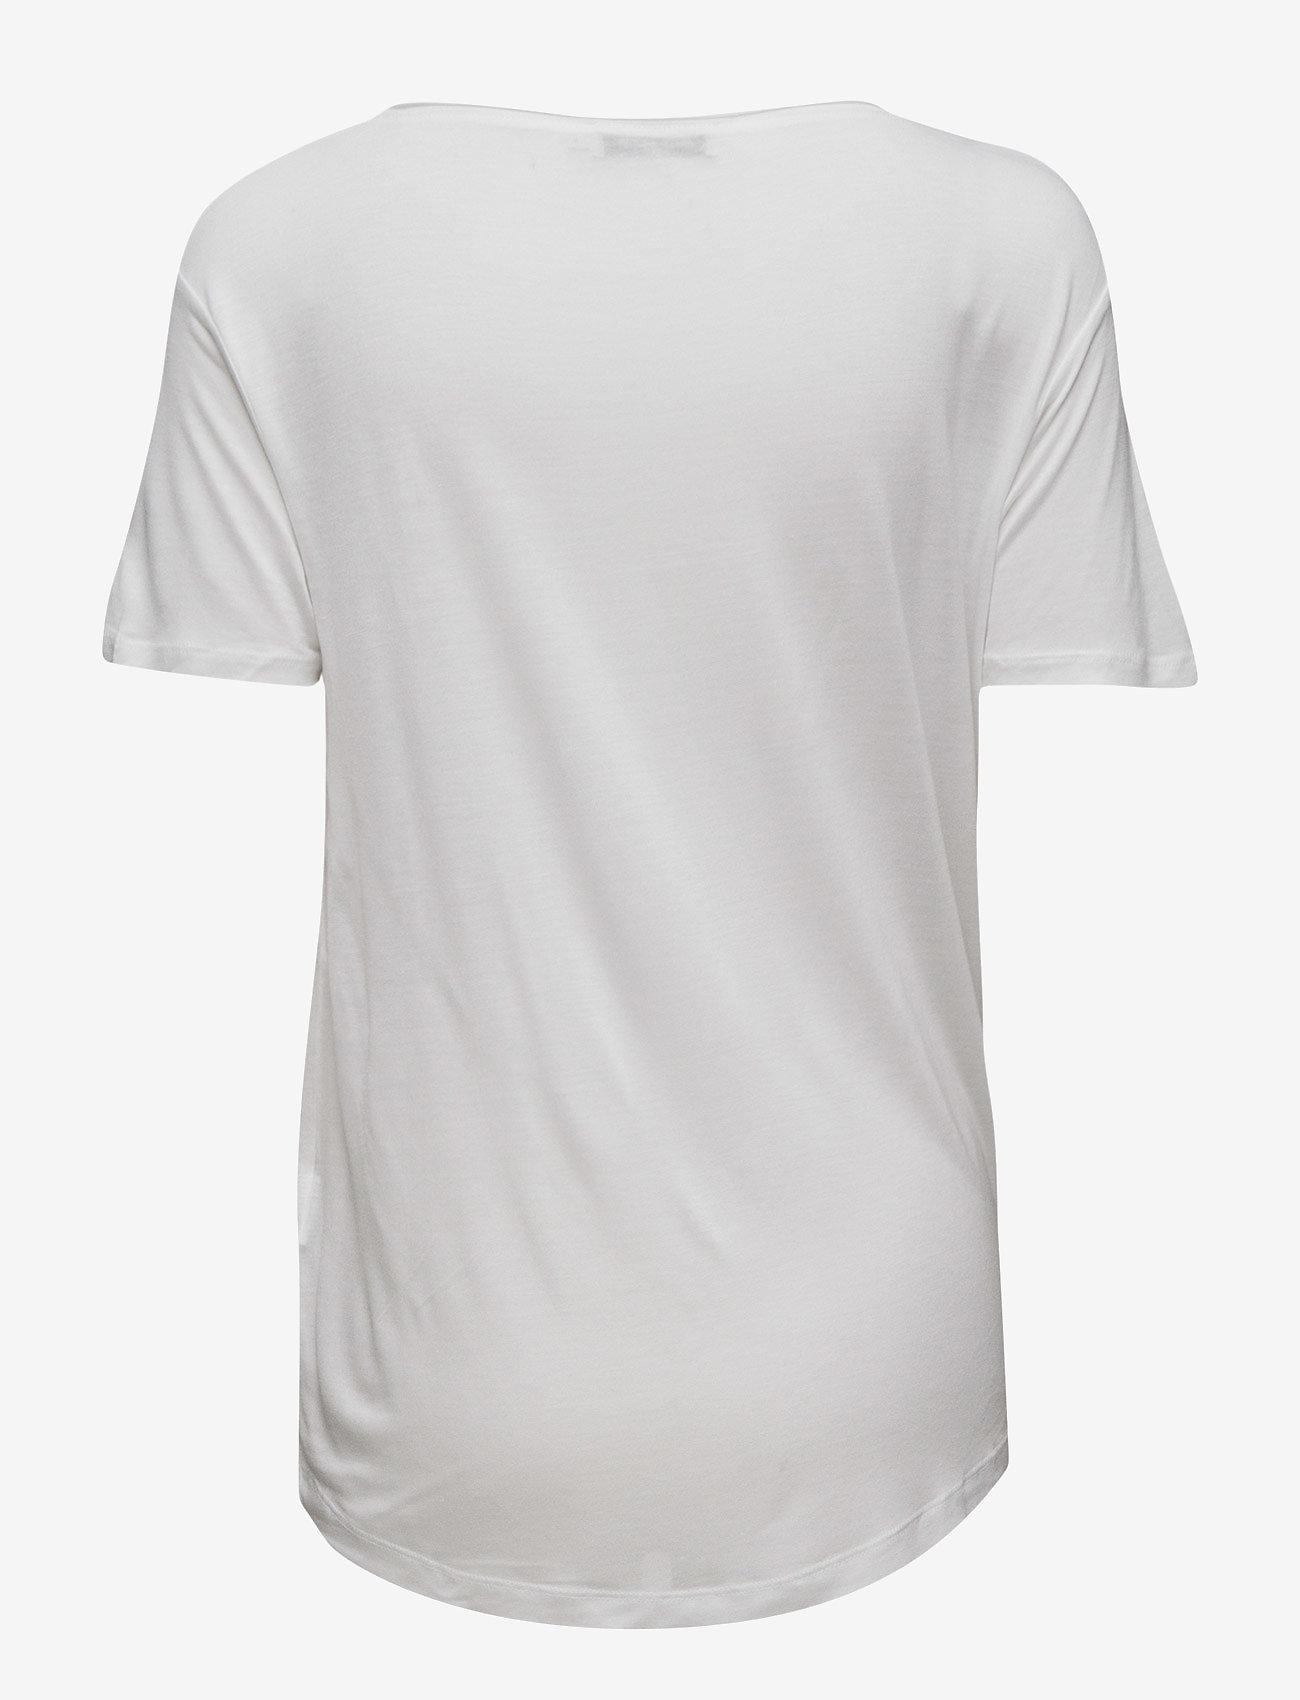 Samsøe Samsøe - Amie ss 2085 - t-shirts & tops - white - 1